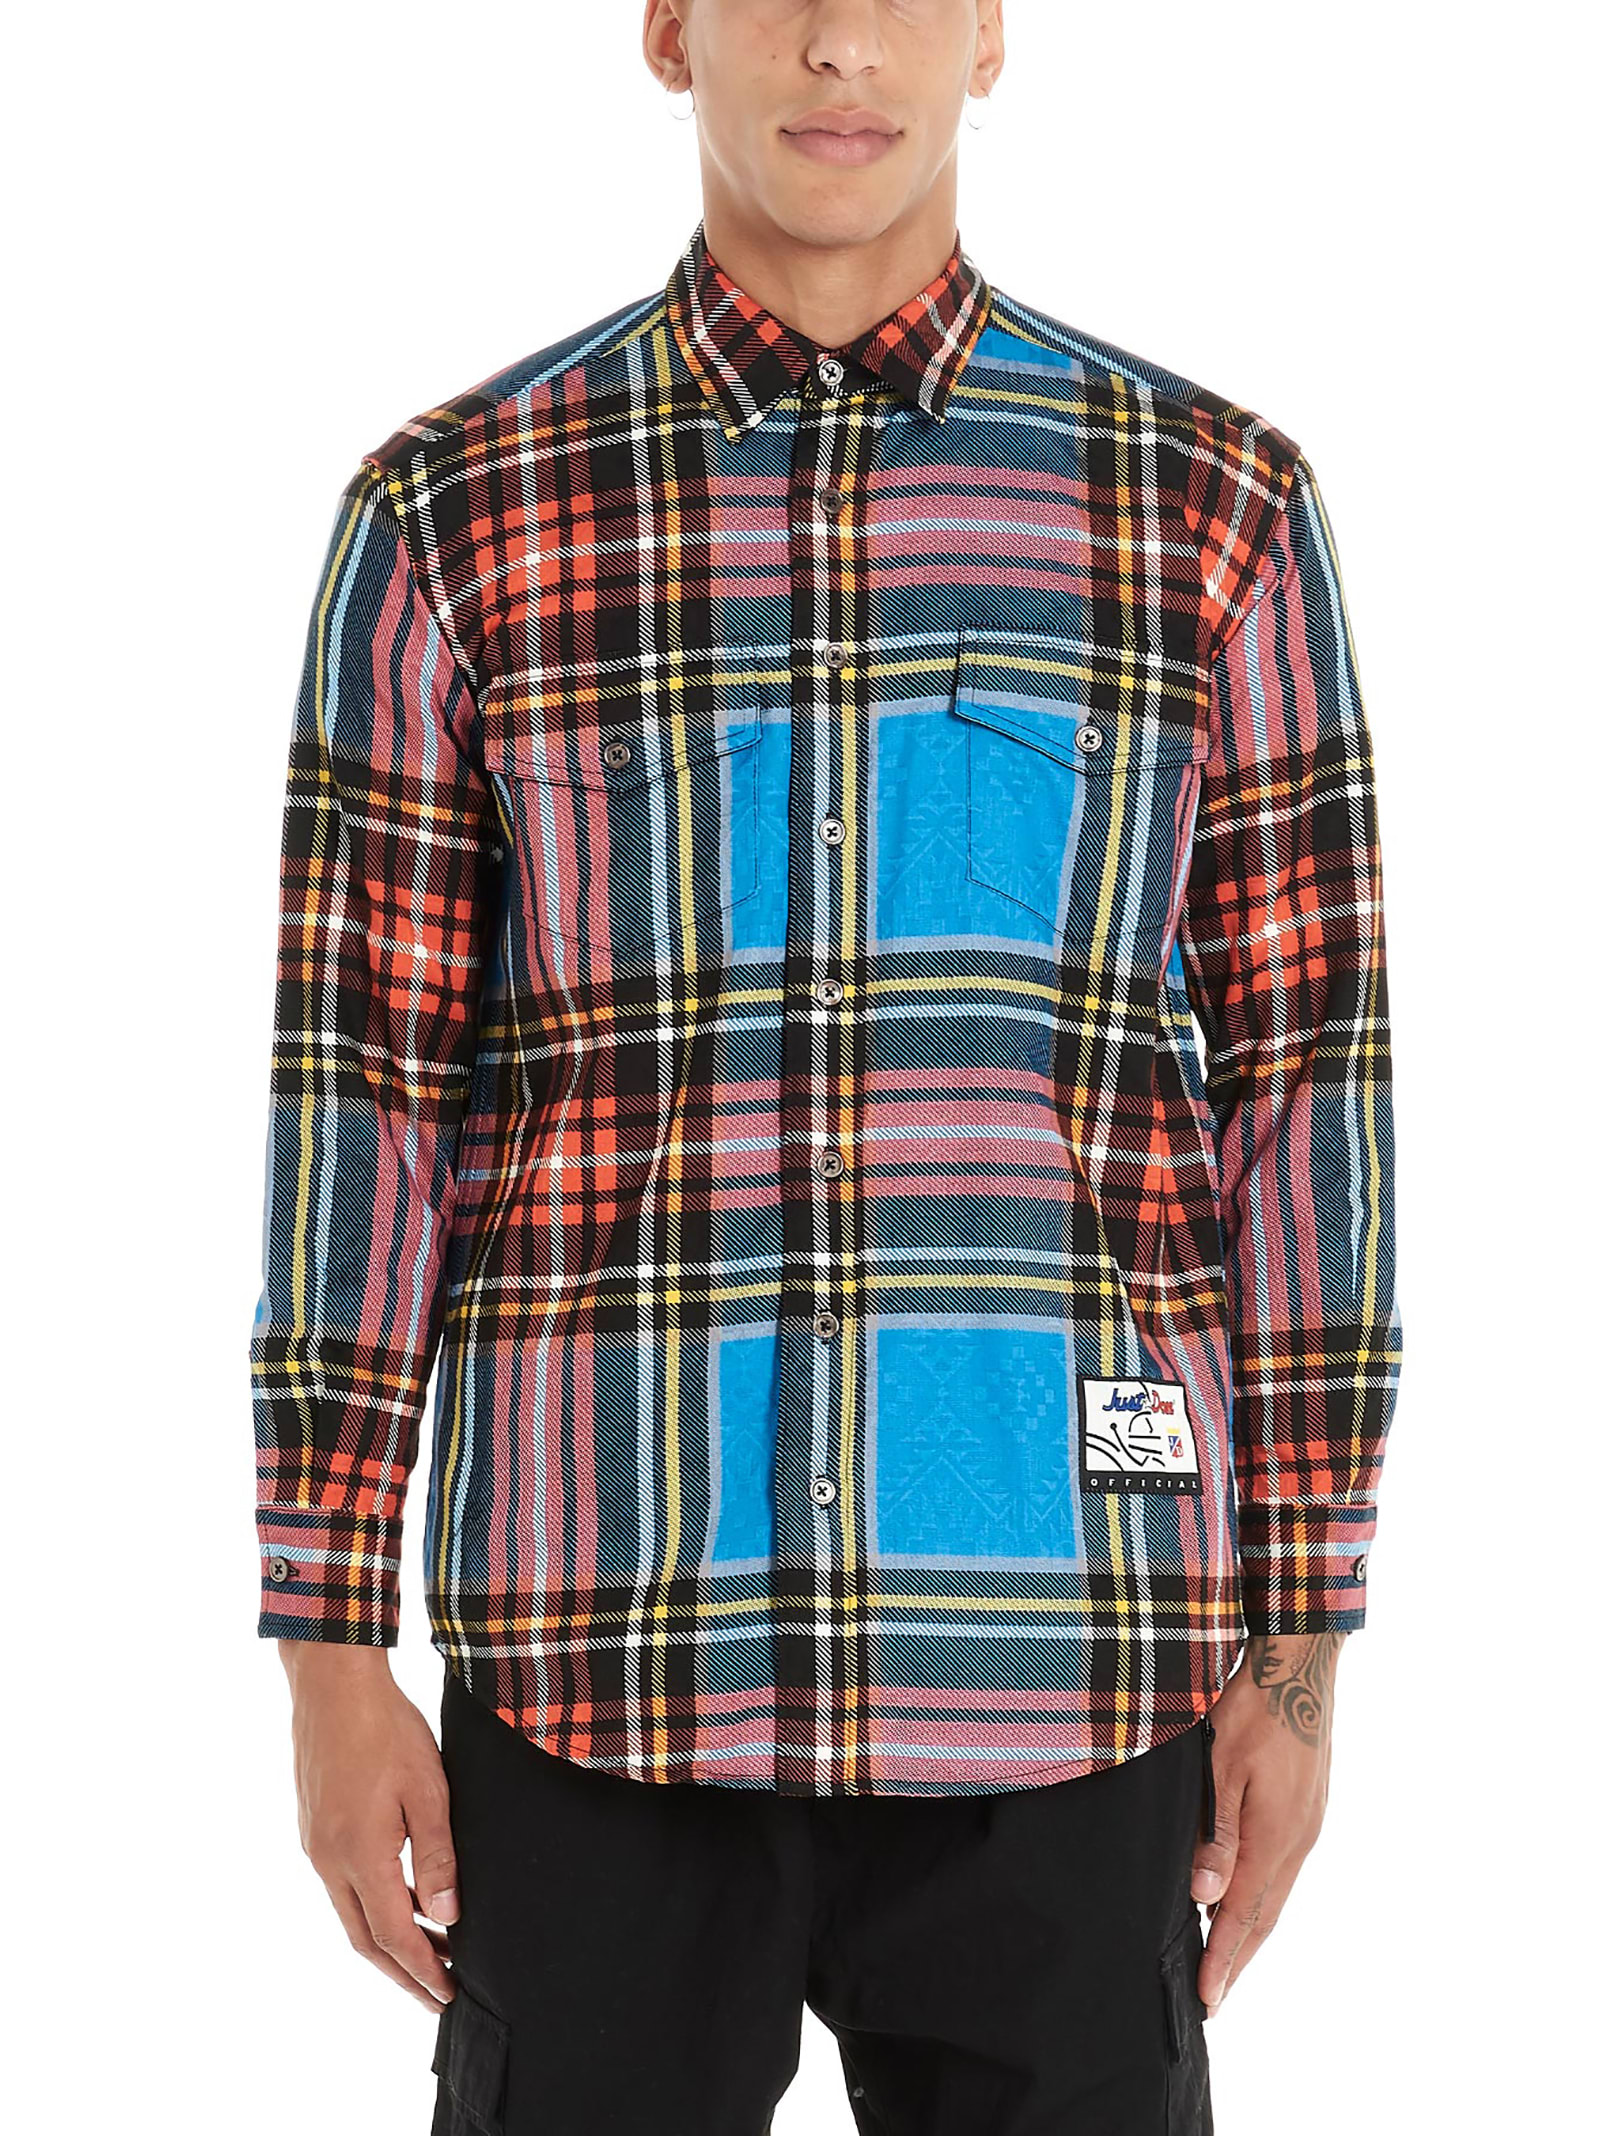 islanders Shirt